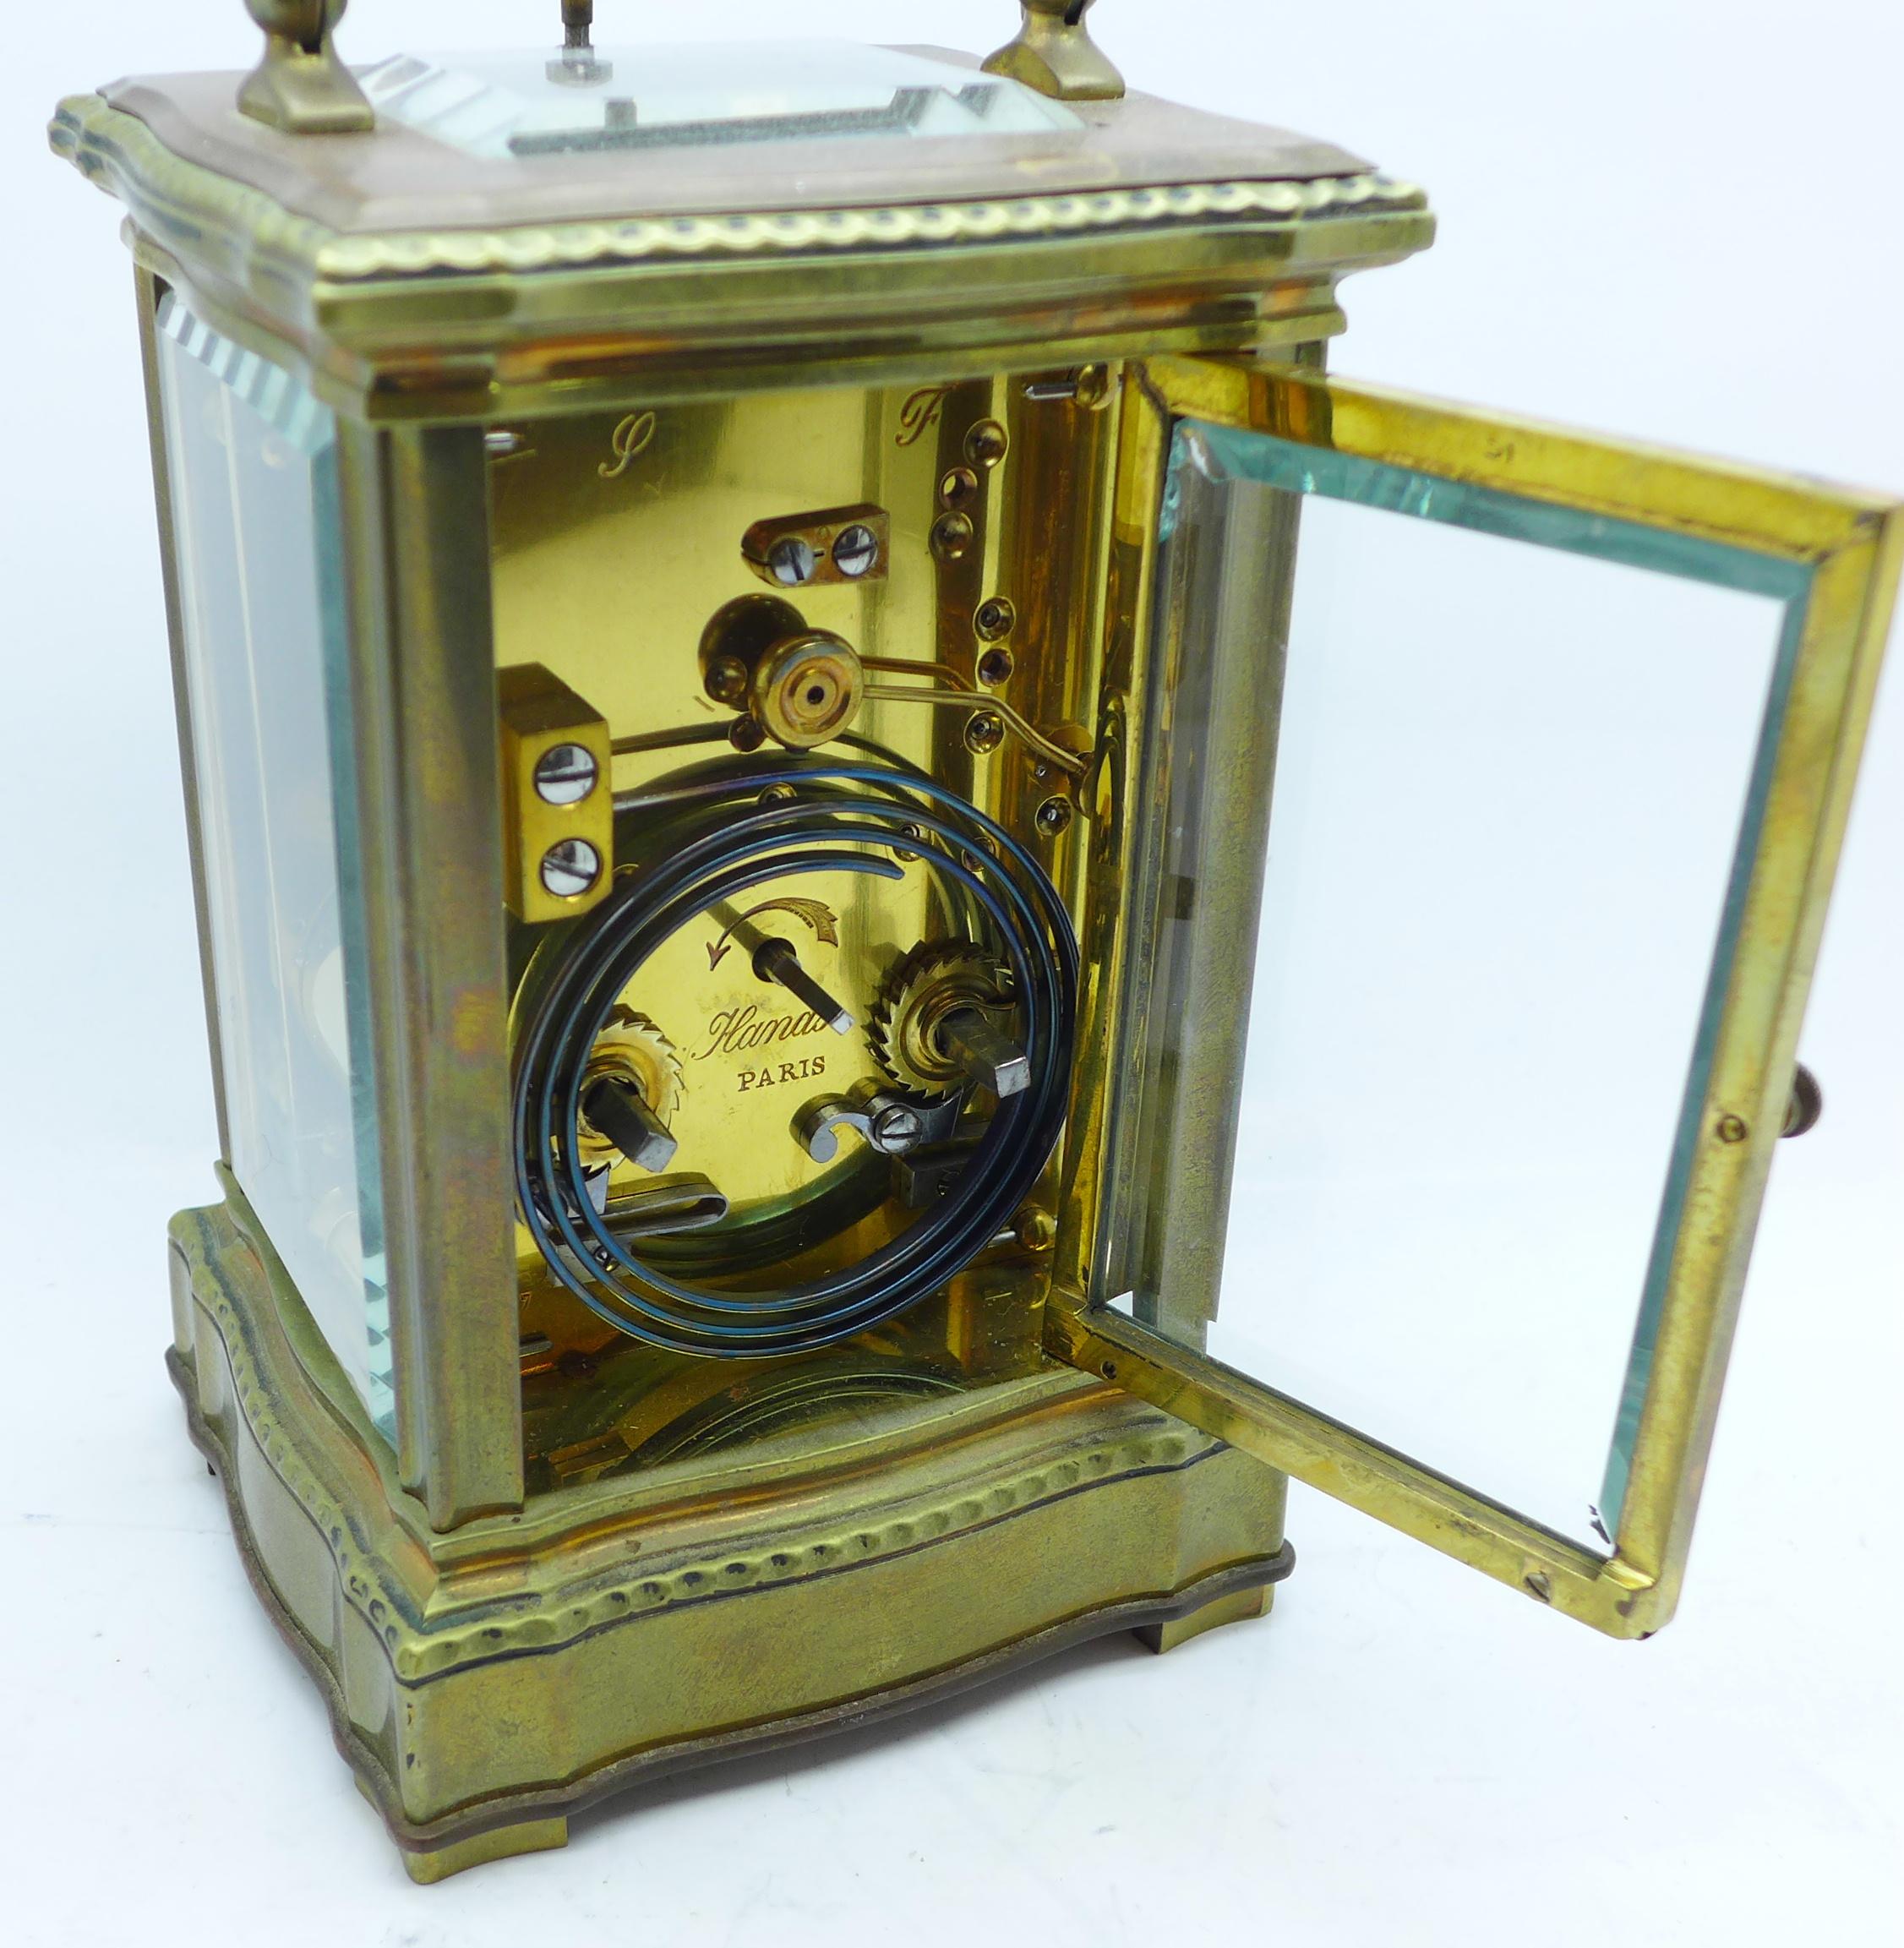 Lot 629 - A brass repeater carriage clock, enamel dial, movement signed Paris, 14cm,